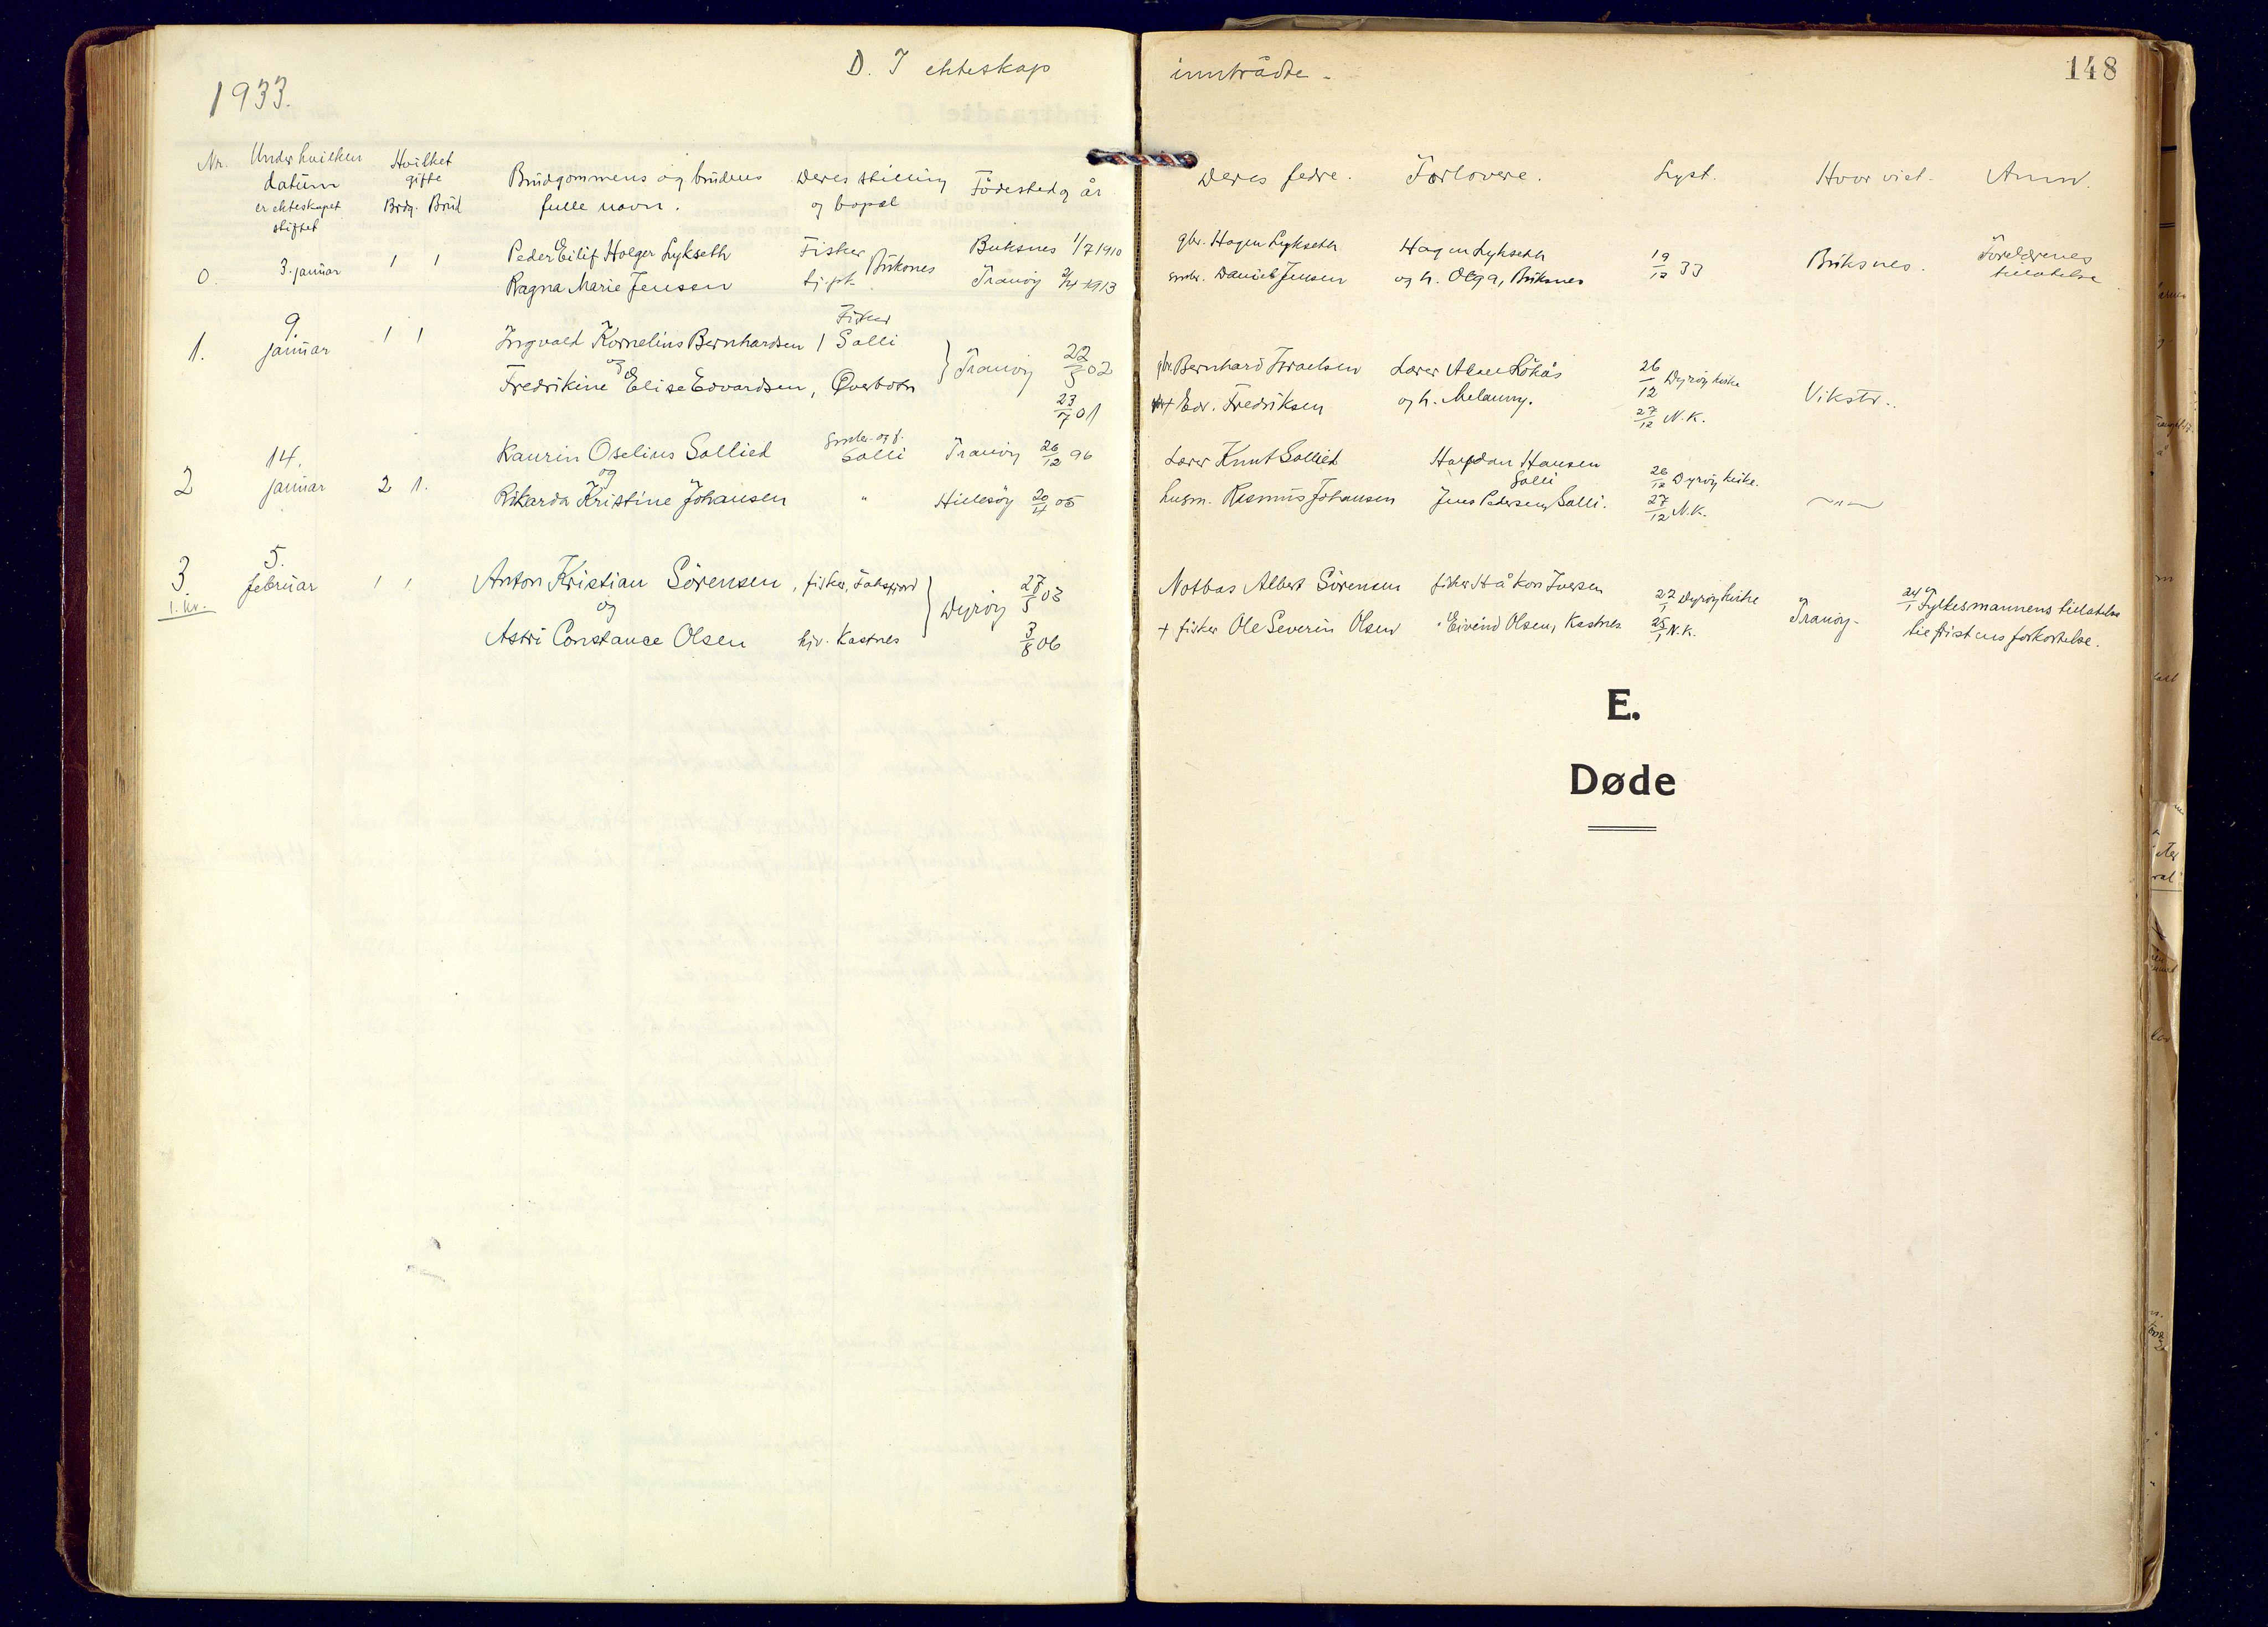 SATØ, Tranøy sokneprestkontor, I/Ia/Iaa: Ministerialbok nr. 16, 1919-1932, s. 148